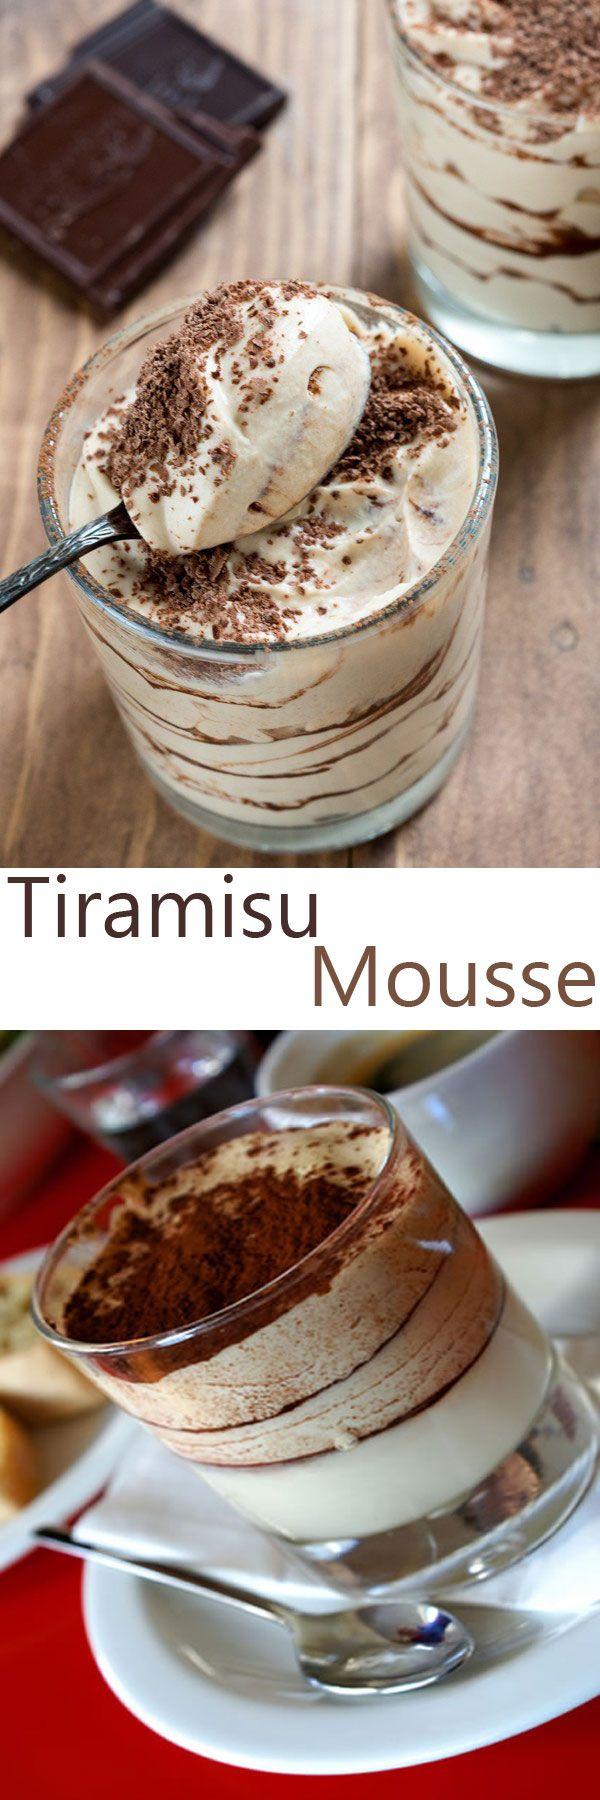 ♨ Tiramisu Mousse